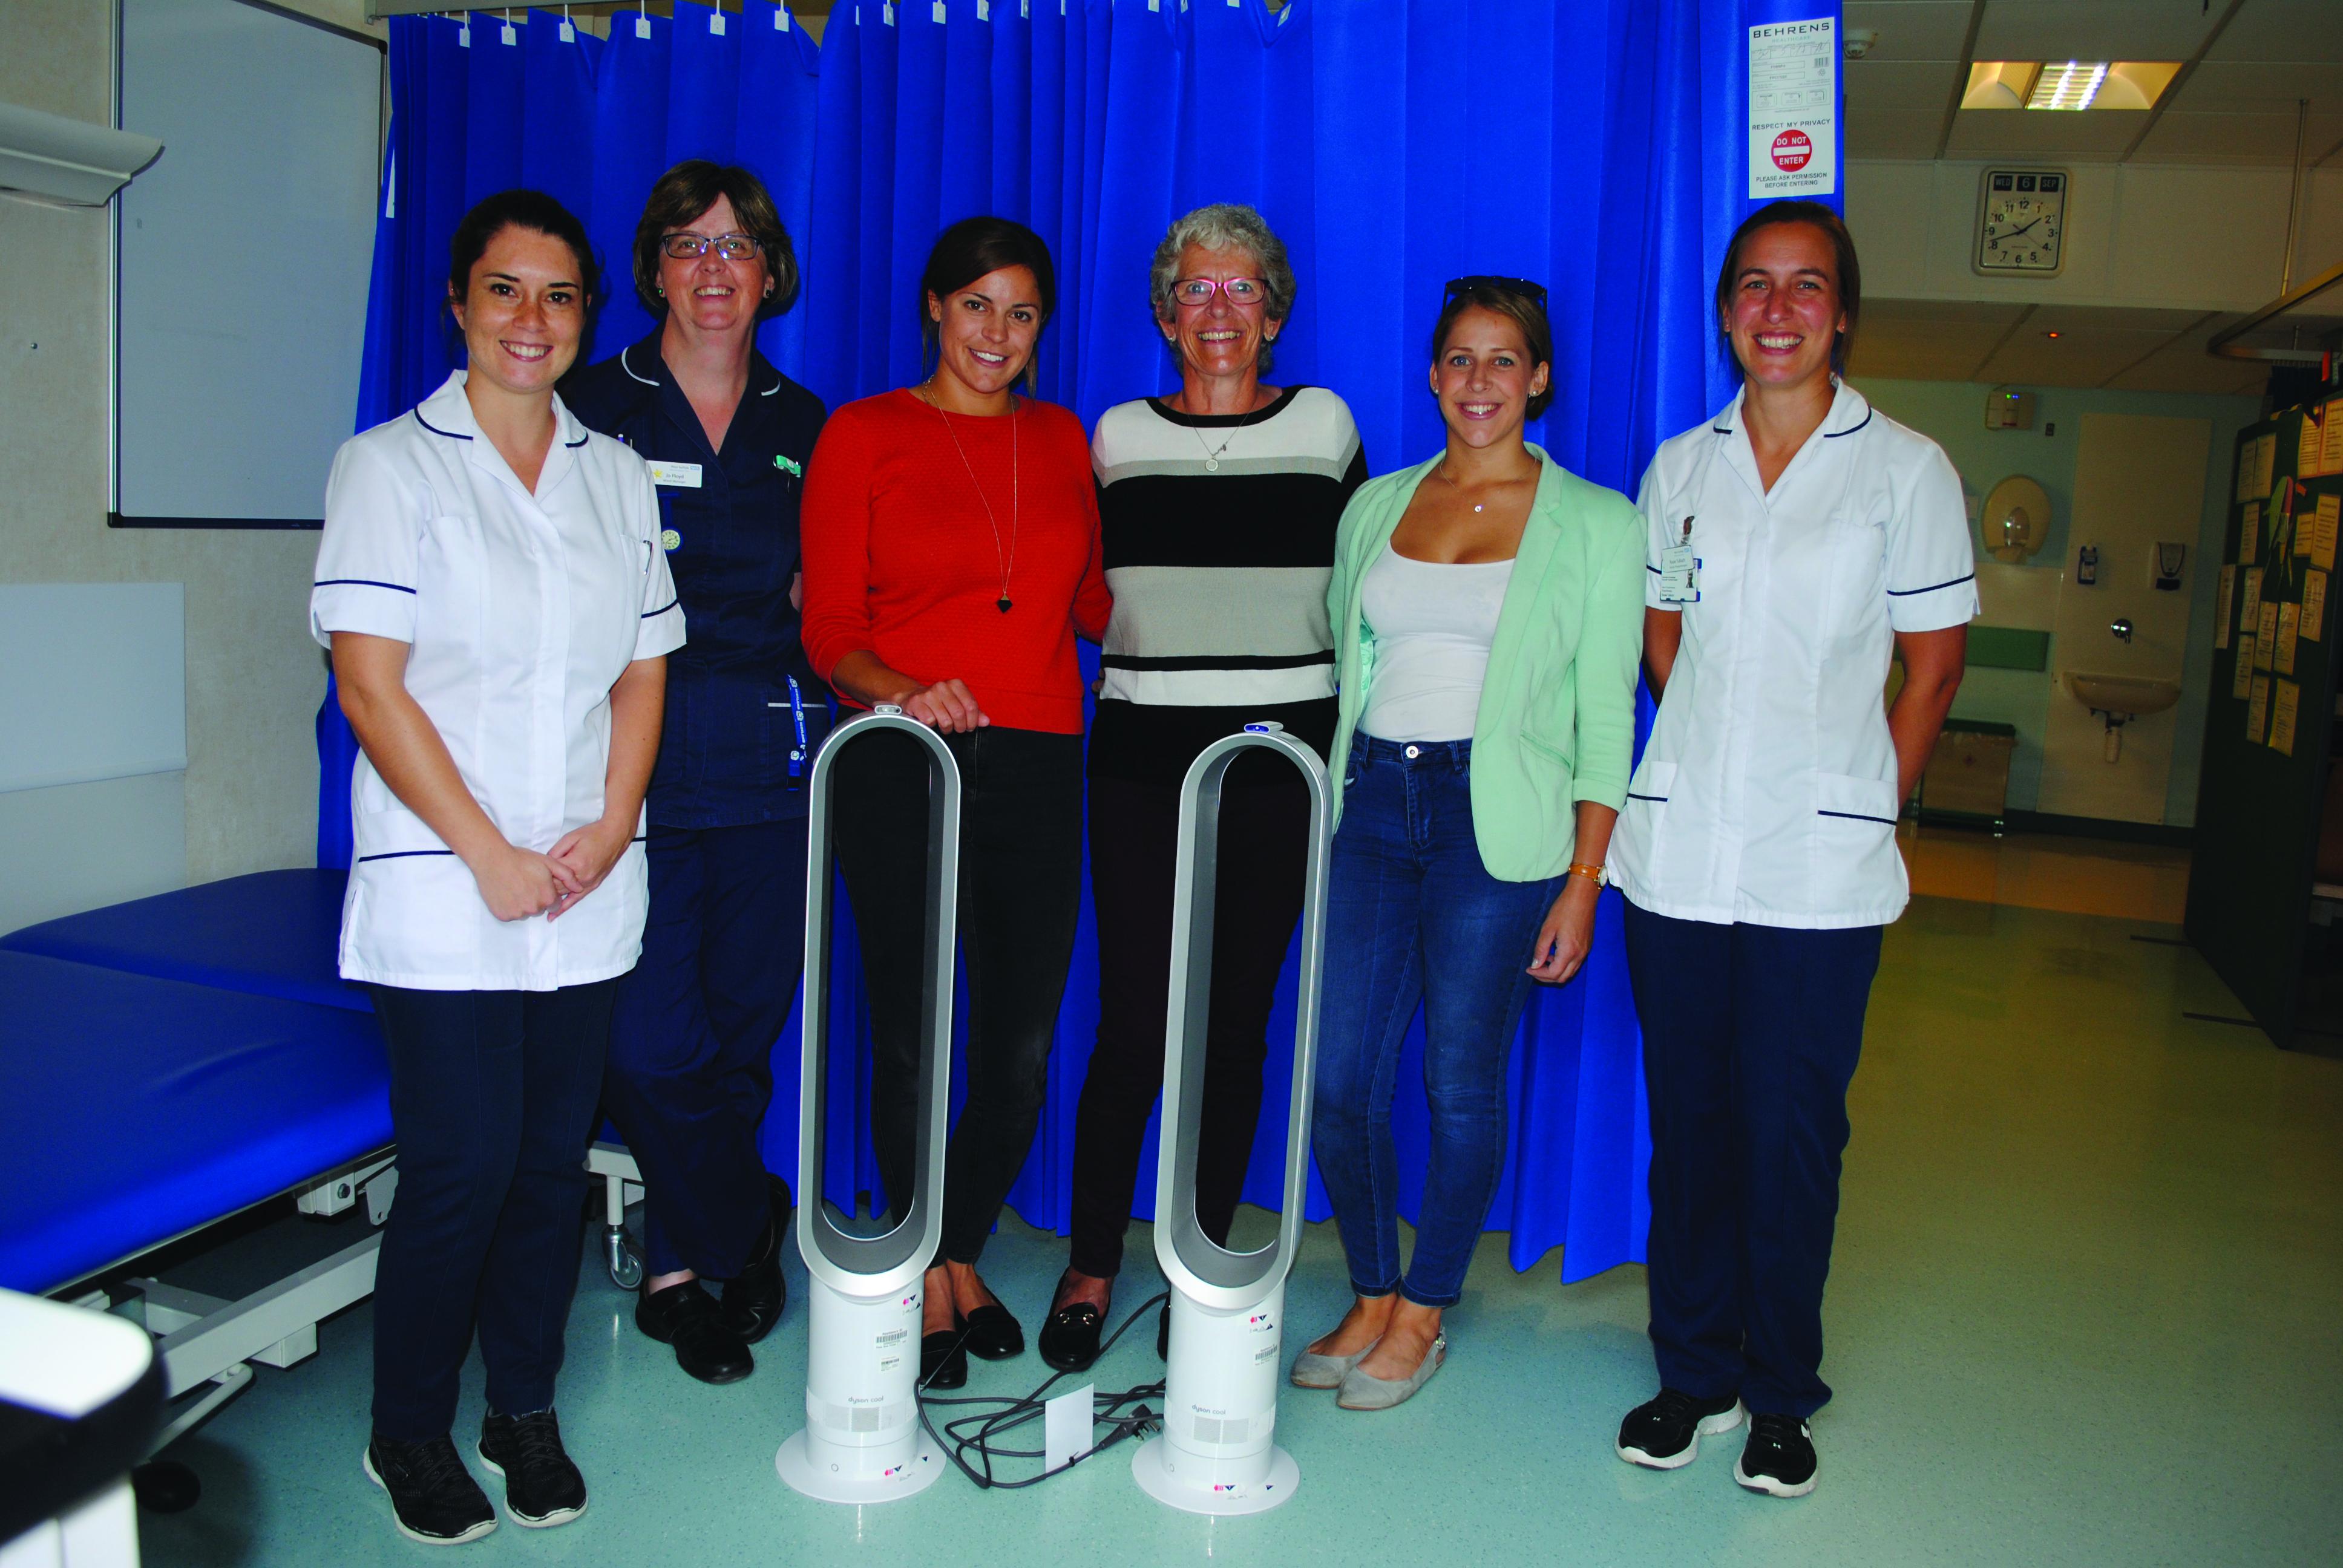 Physio, Jo Floyd ward manager, Katie McLernon, Carol McLernon, Lucy McLernon, physio